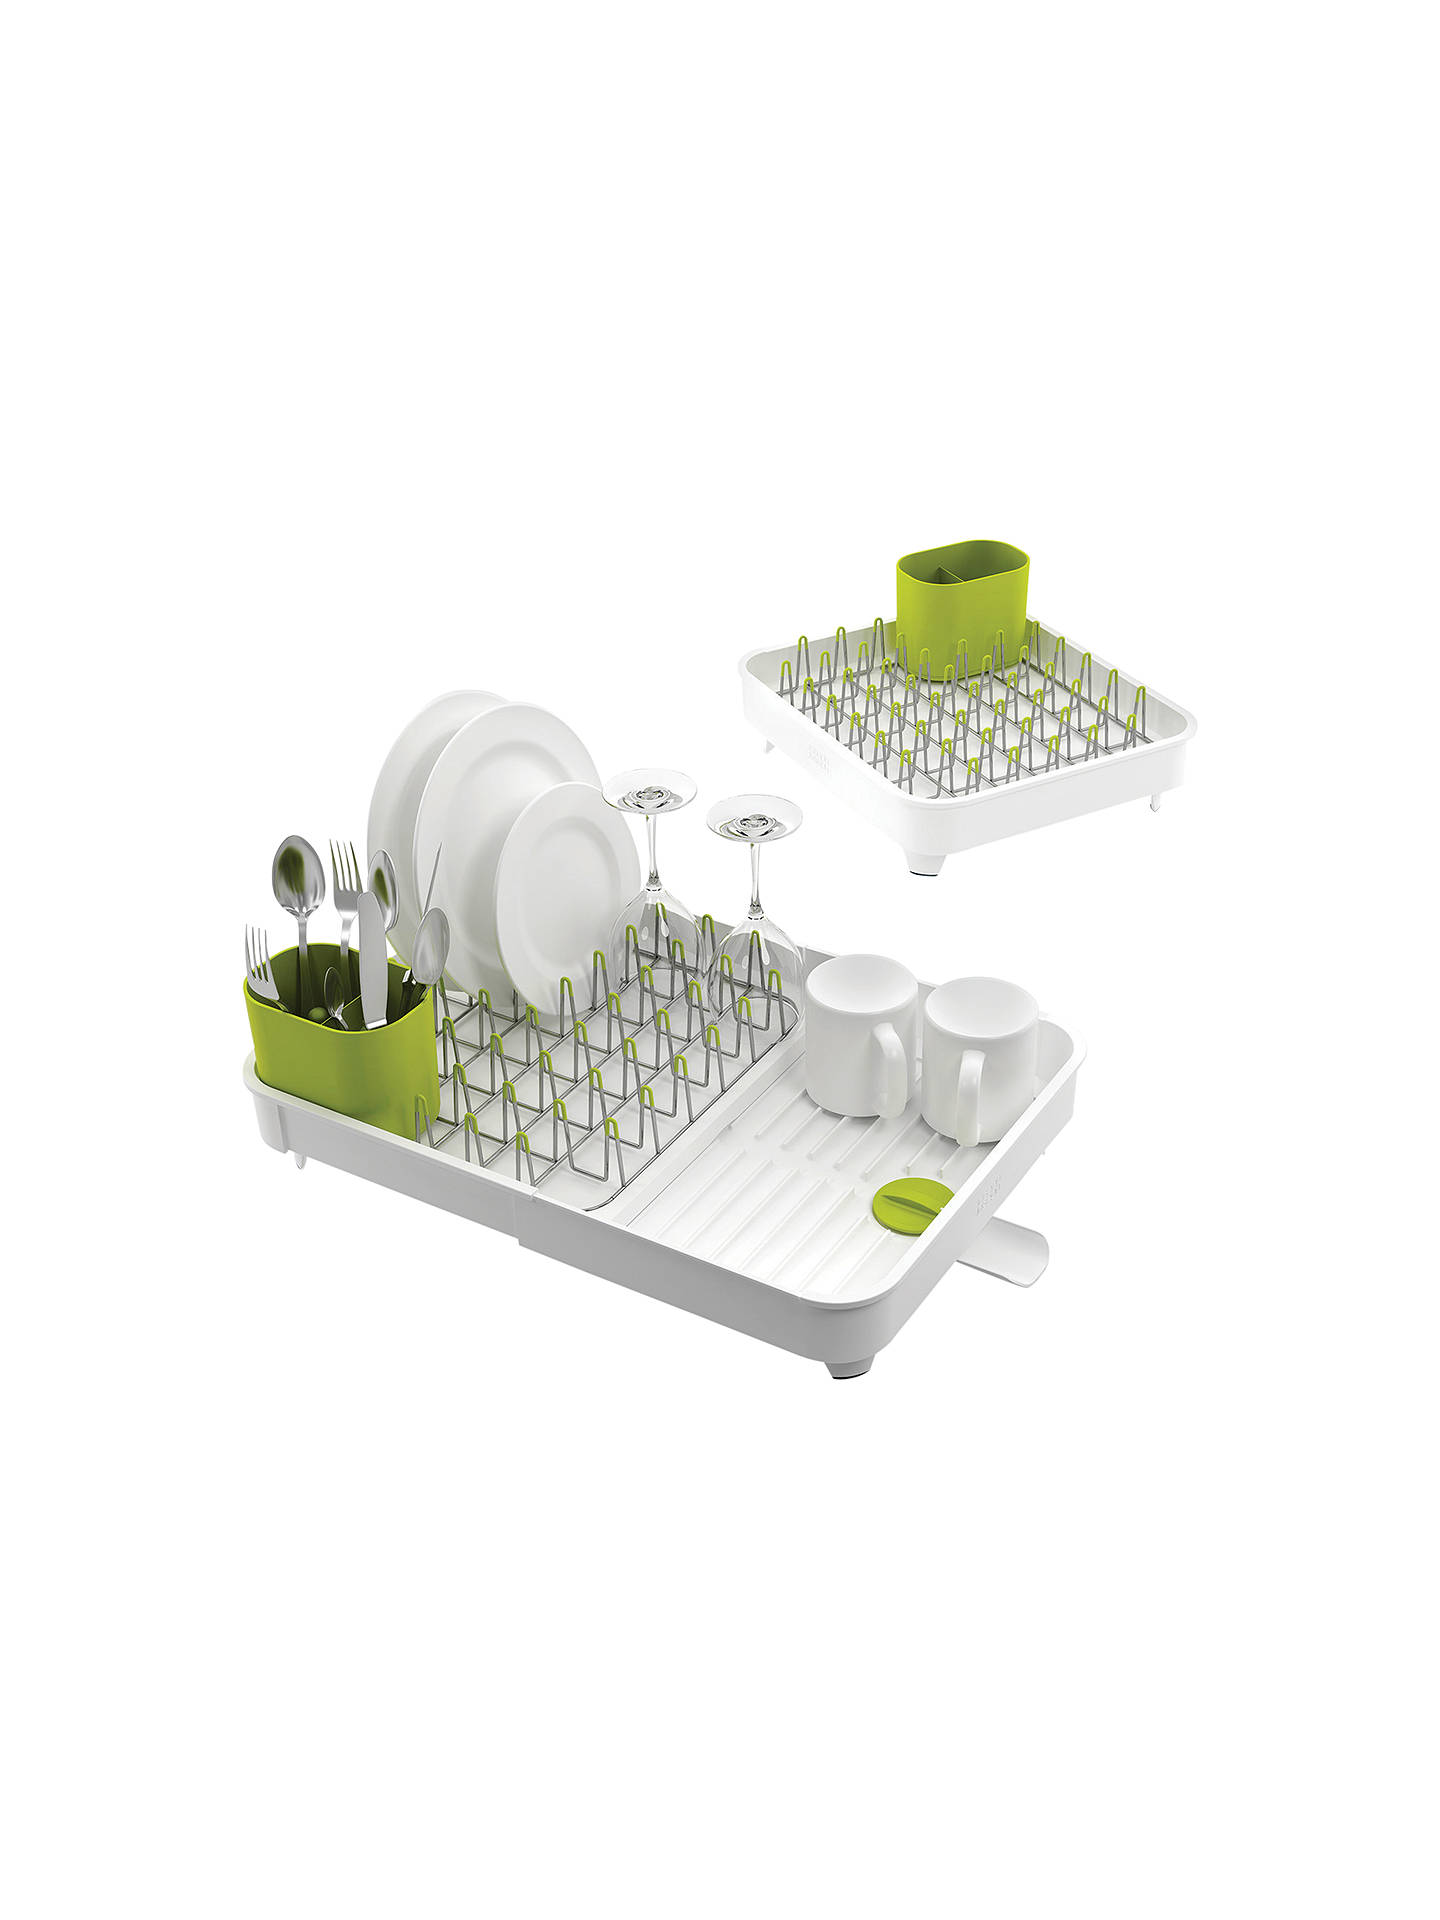 Joseph Extend Expandable Dish Rack White Green Online At Johnlewis